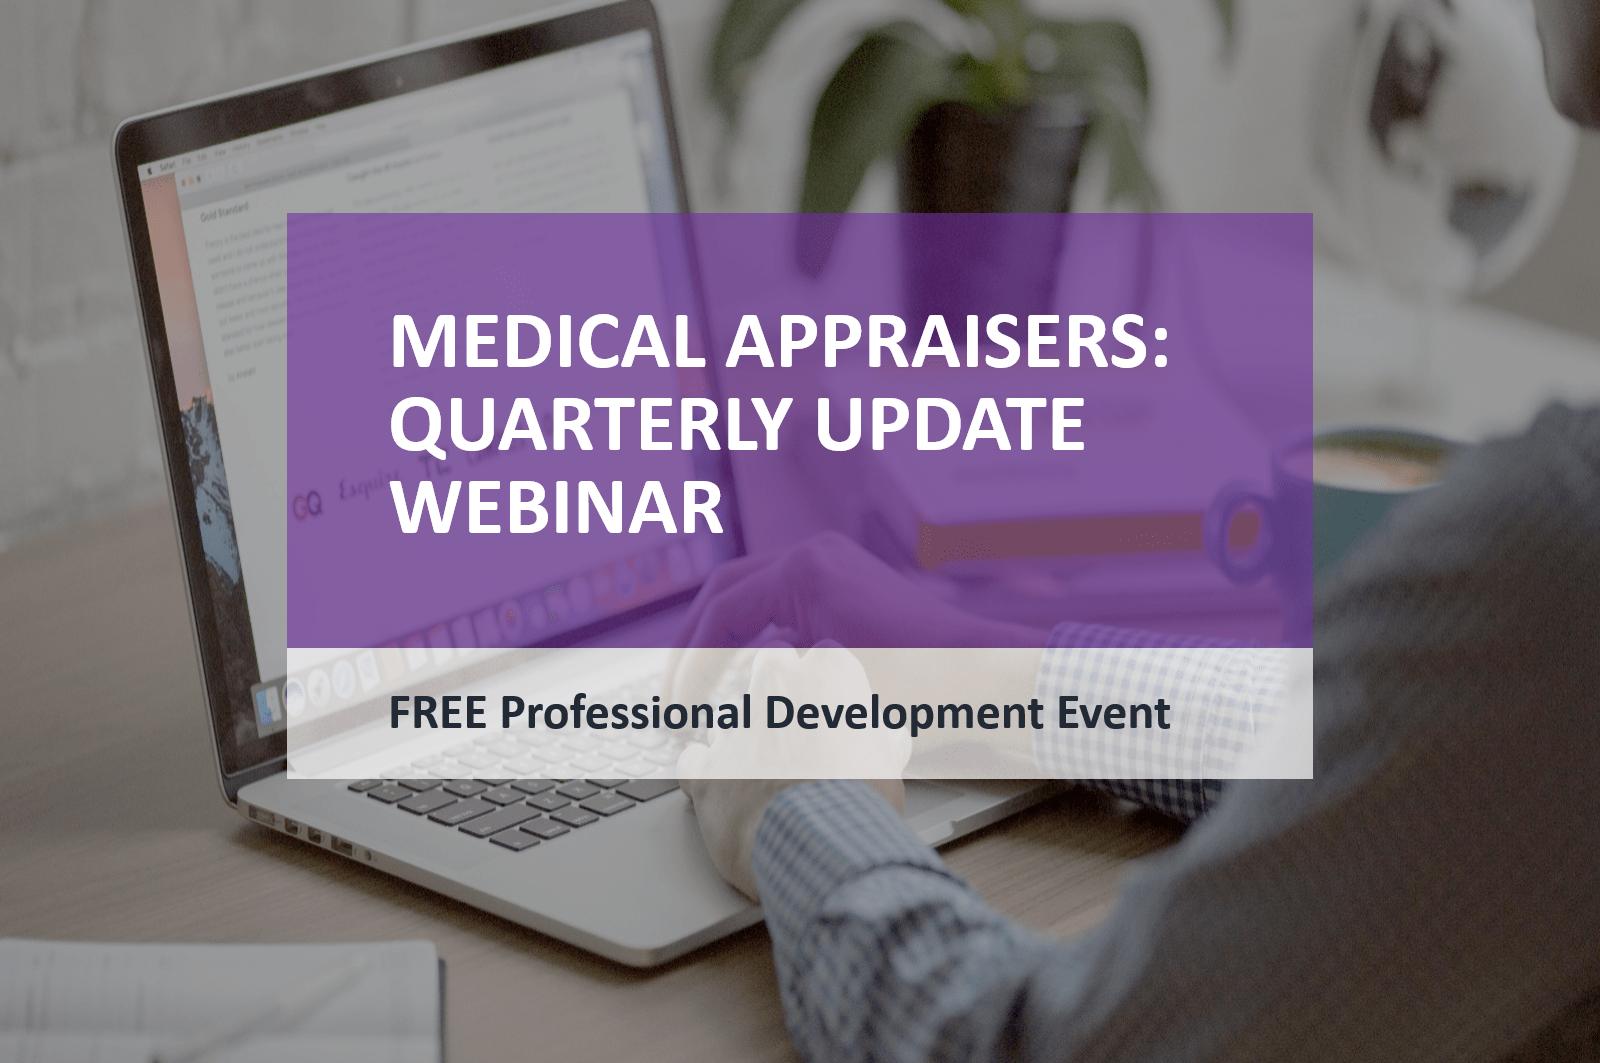 Medical Appraiser Update Webinar FREE